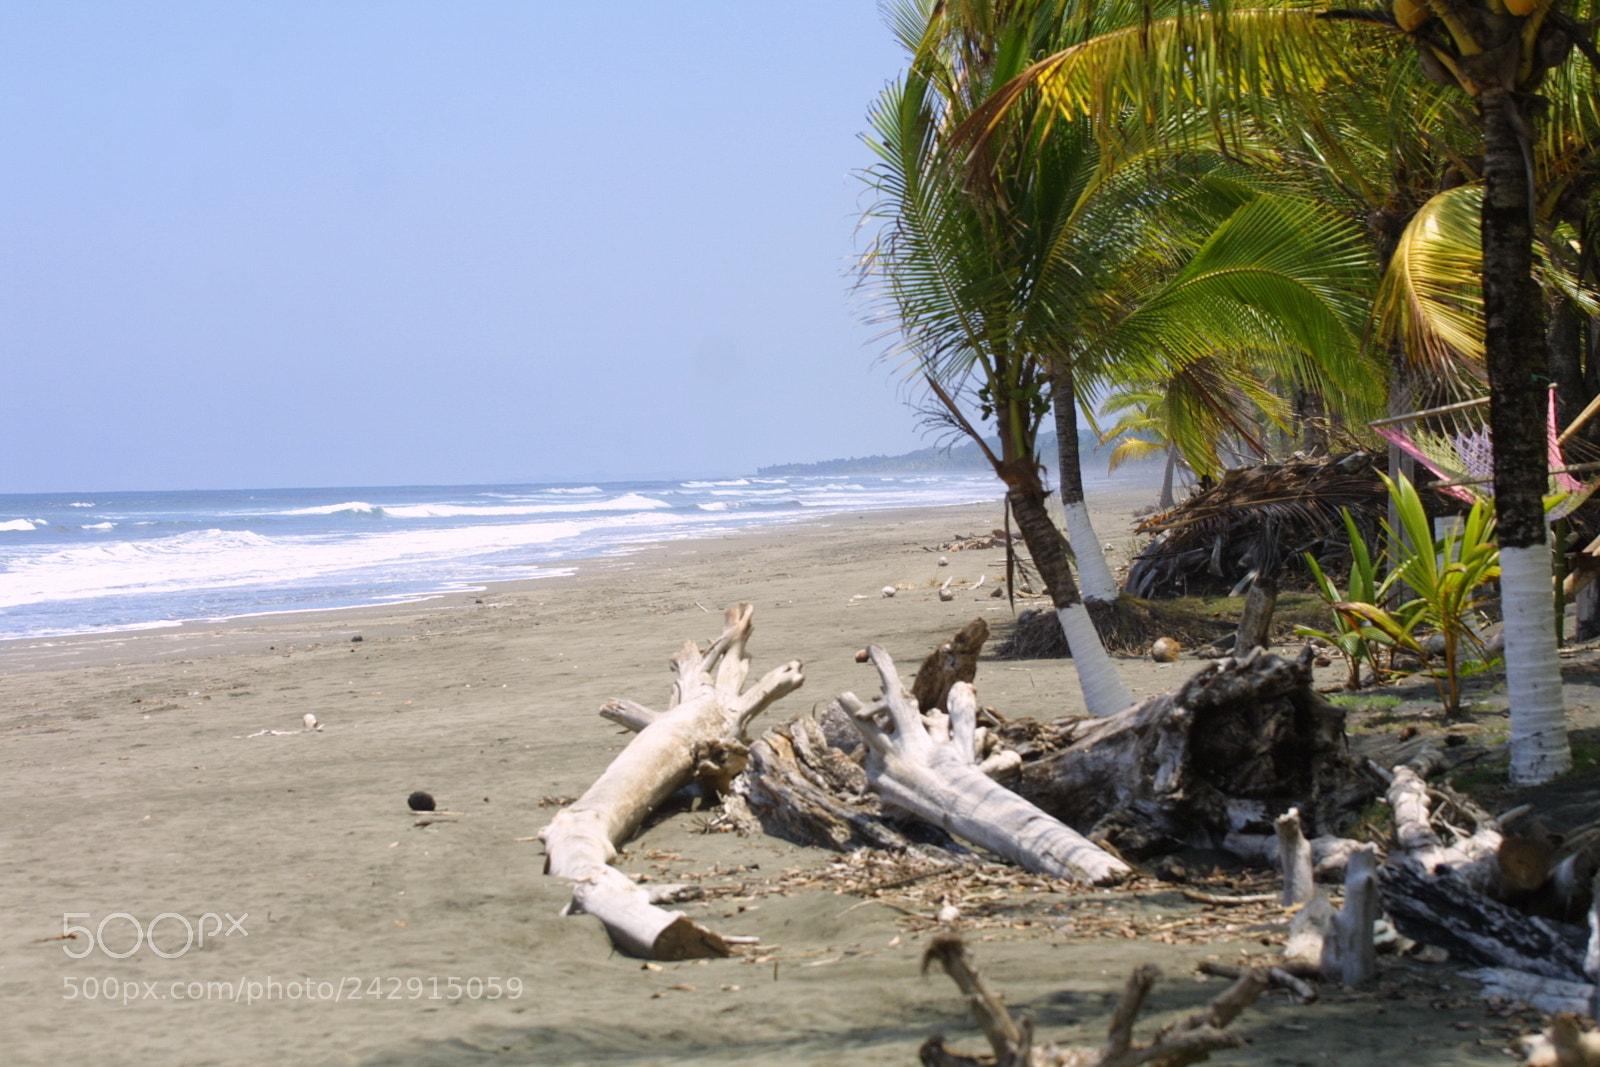 Wild beach with wind, Canon EOS D30, Canon EF 70-200mm f/4L